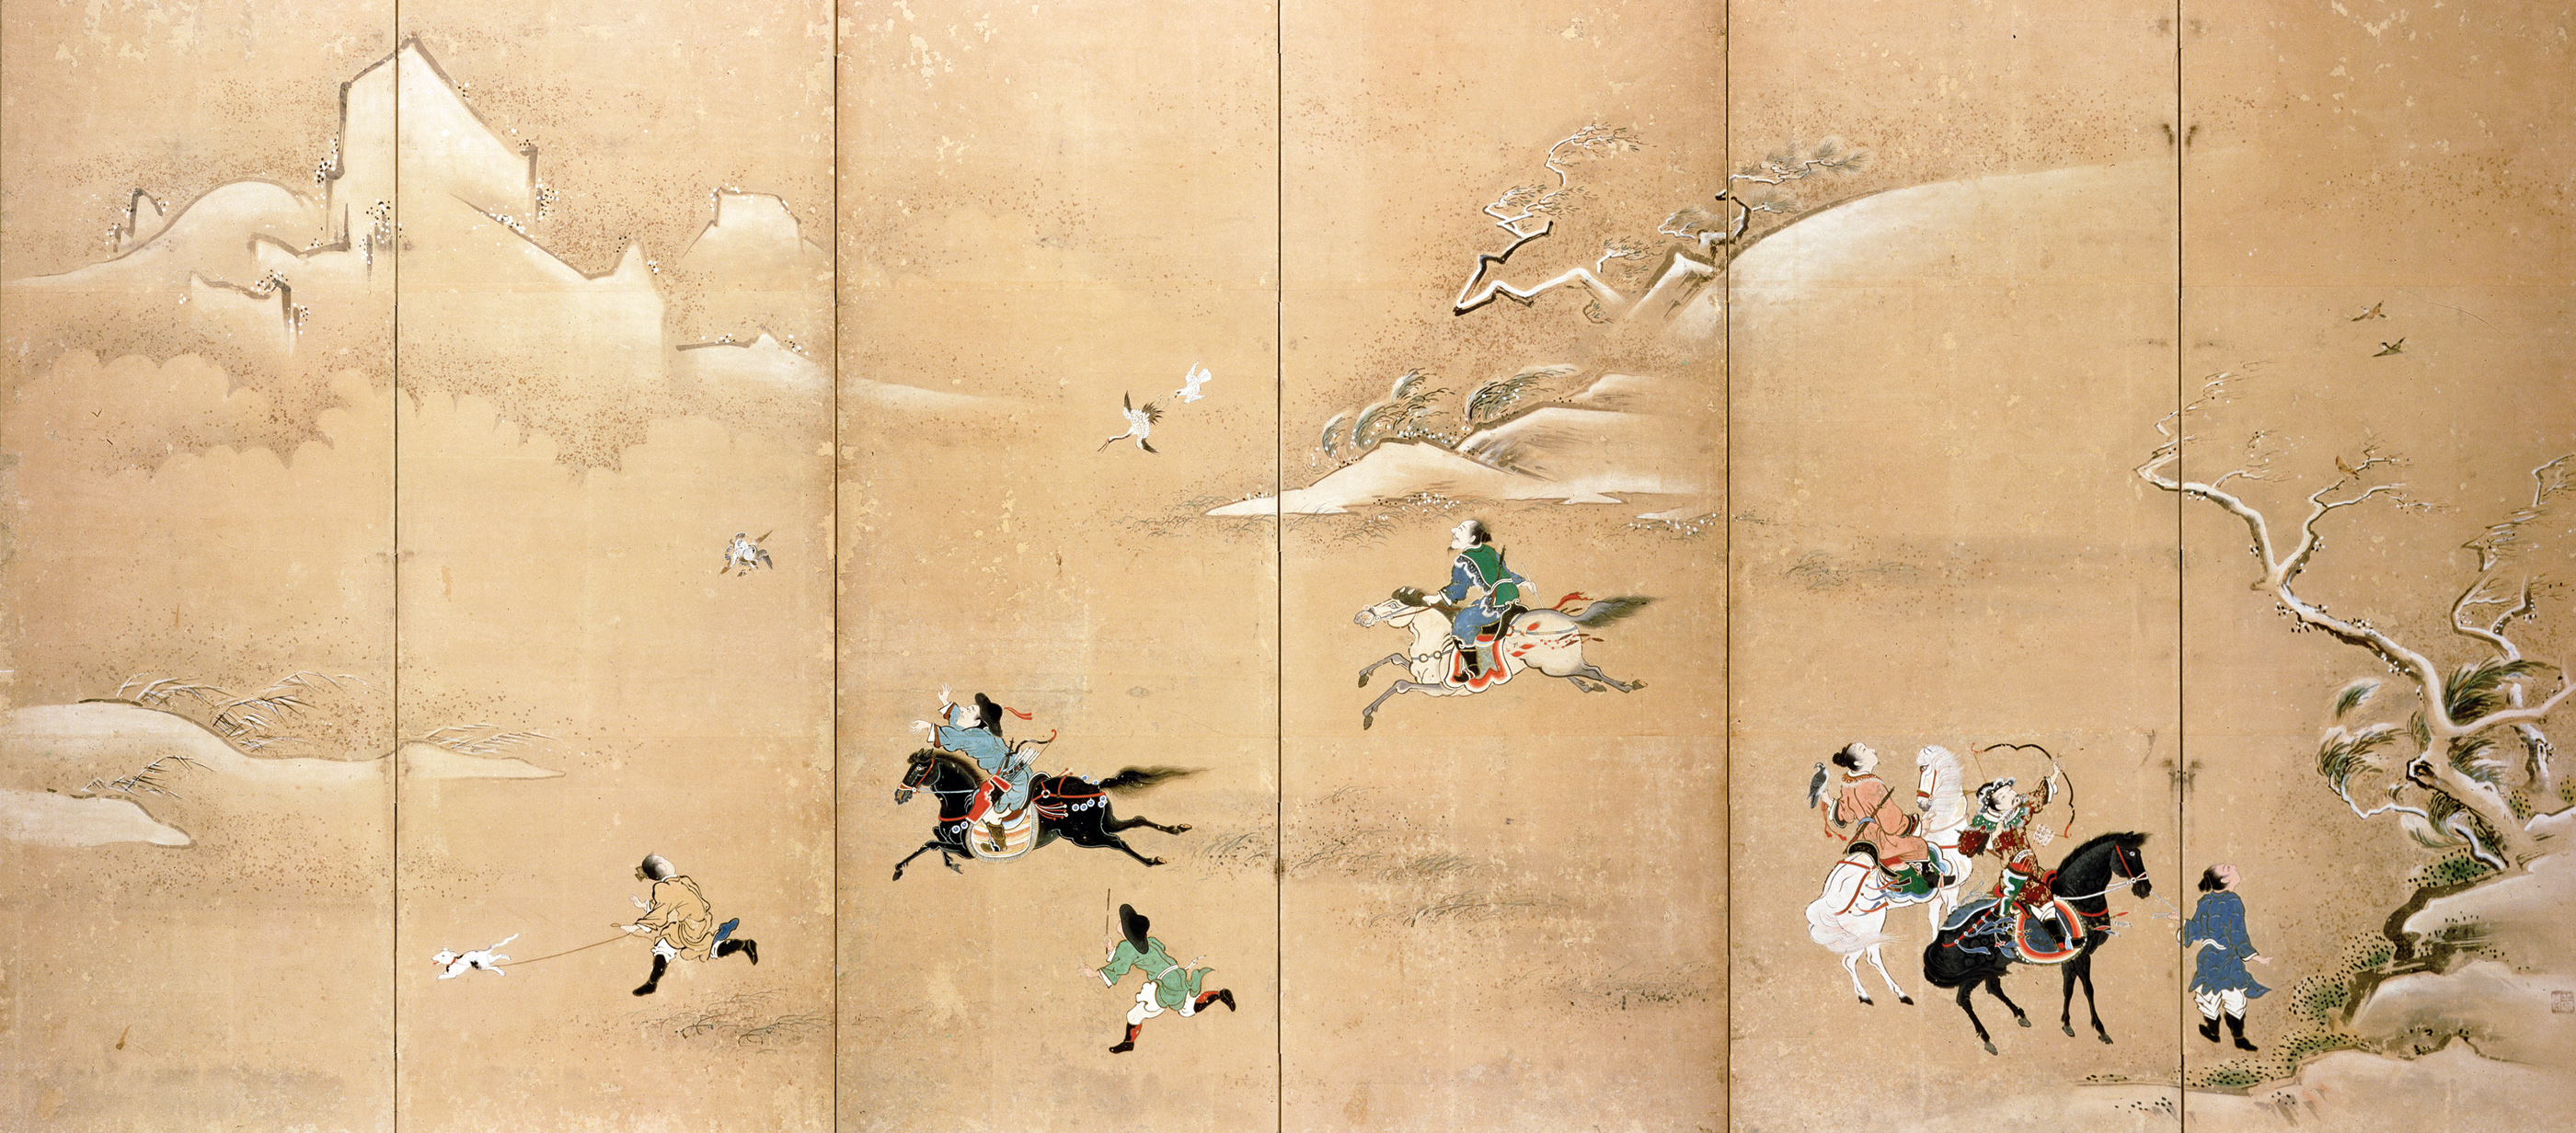 Boar hunt, Japanese folding screen, c. 1800. © Christie's Images/The Bridgeman Art Library International.